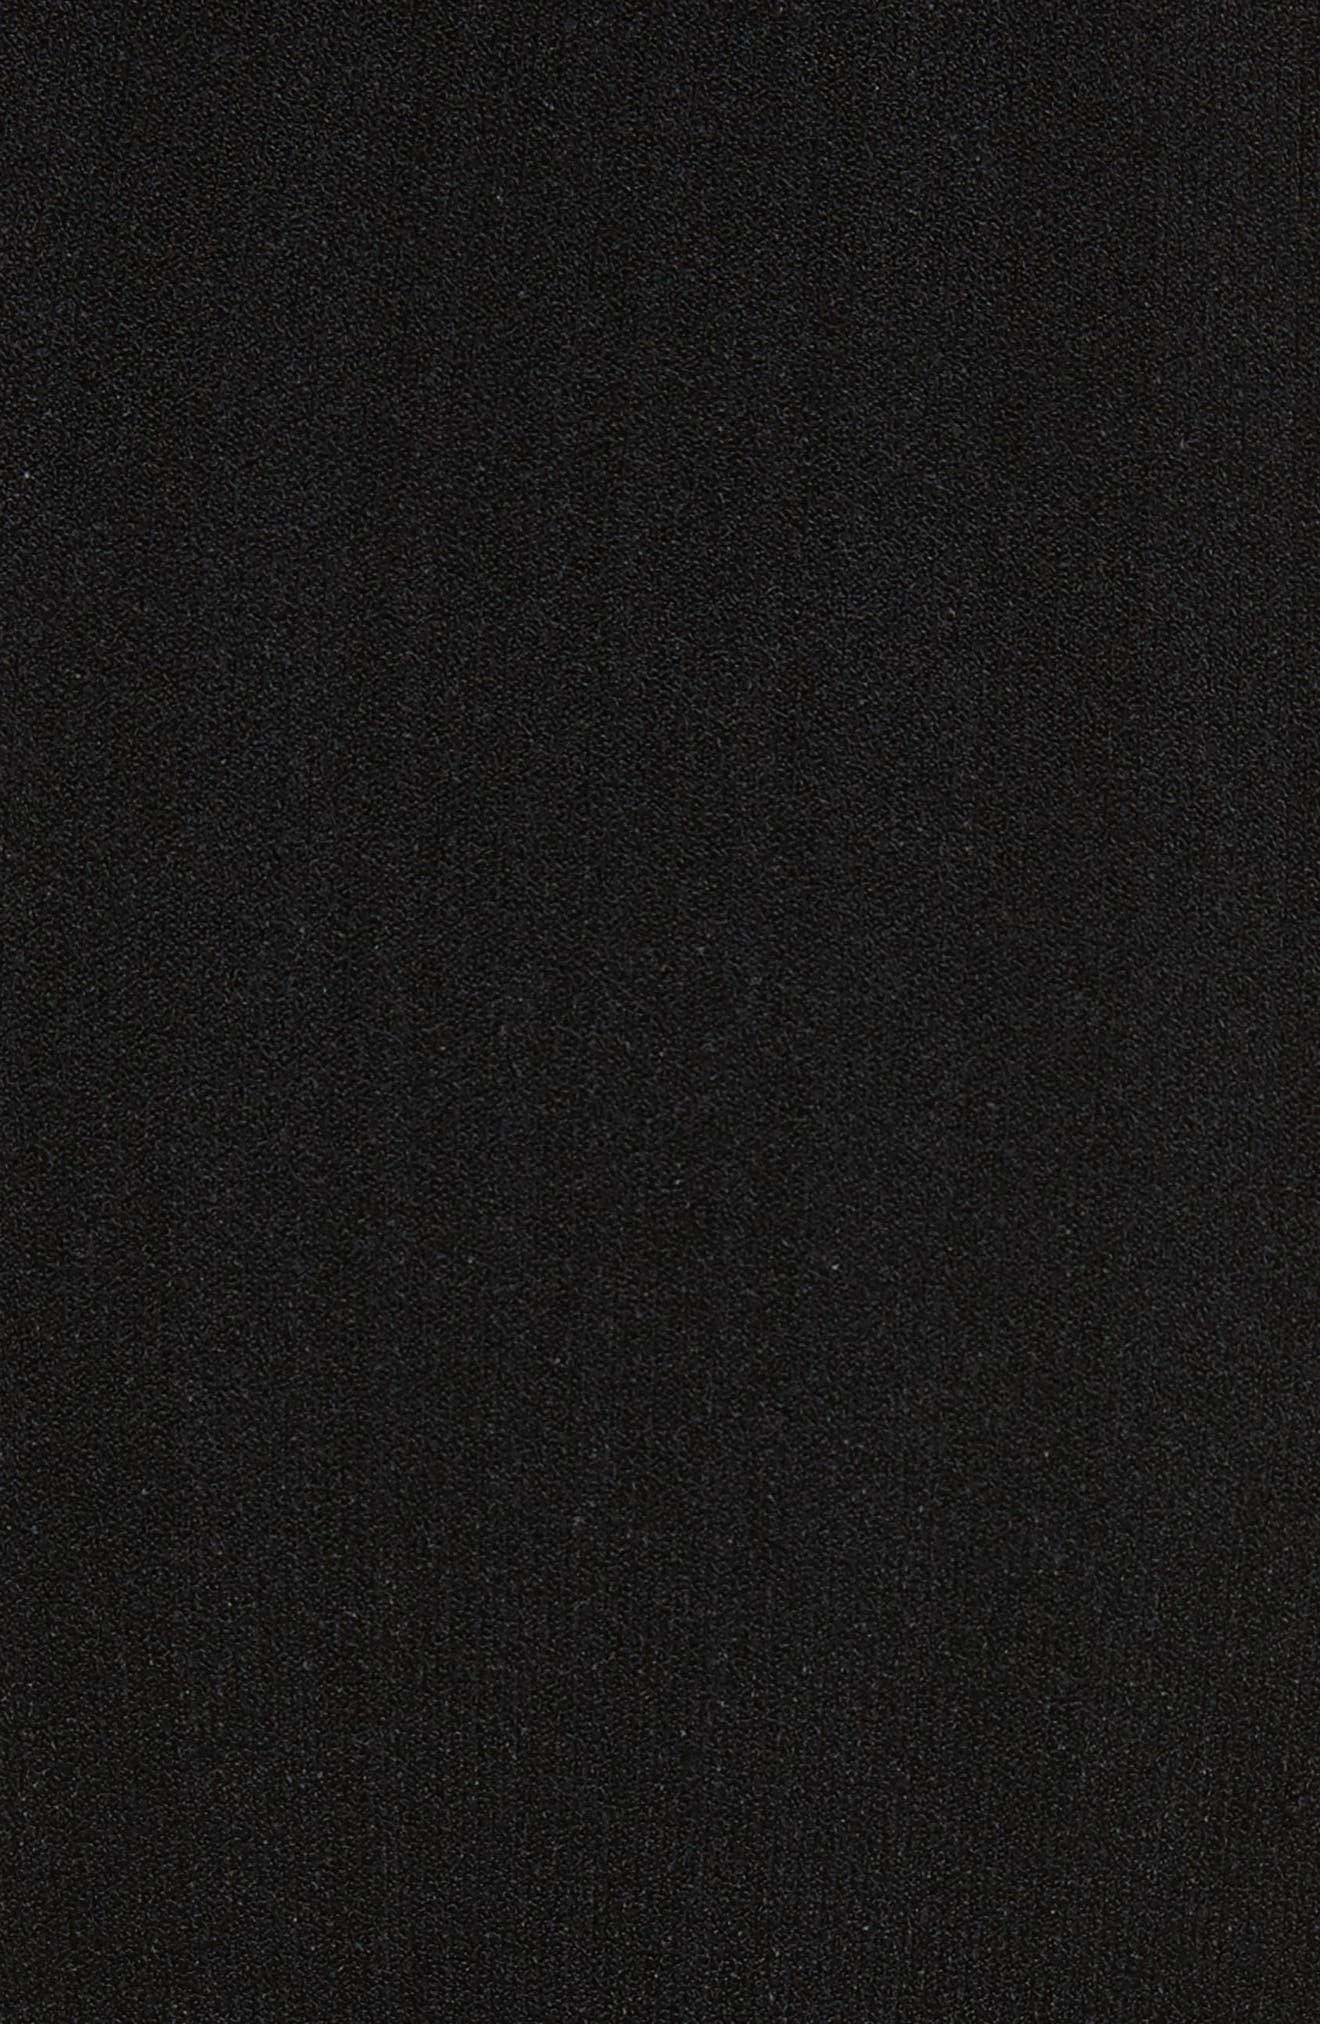 Abstract Ruffle Skirt,                             Alternate thumbnail 5, color,                             001